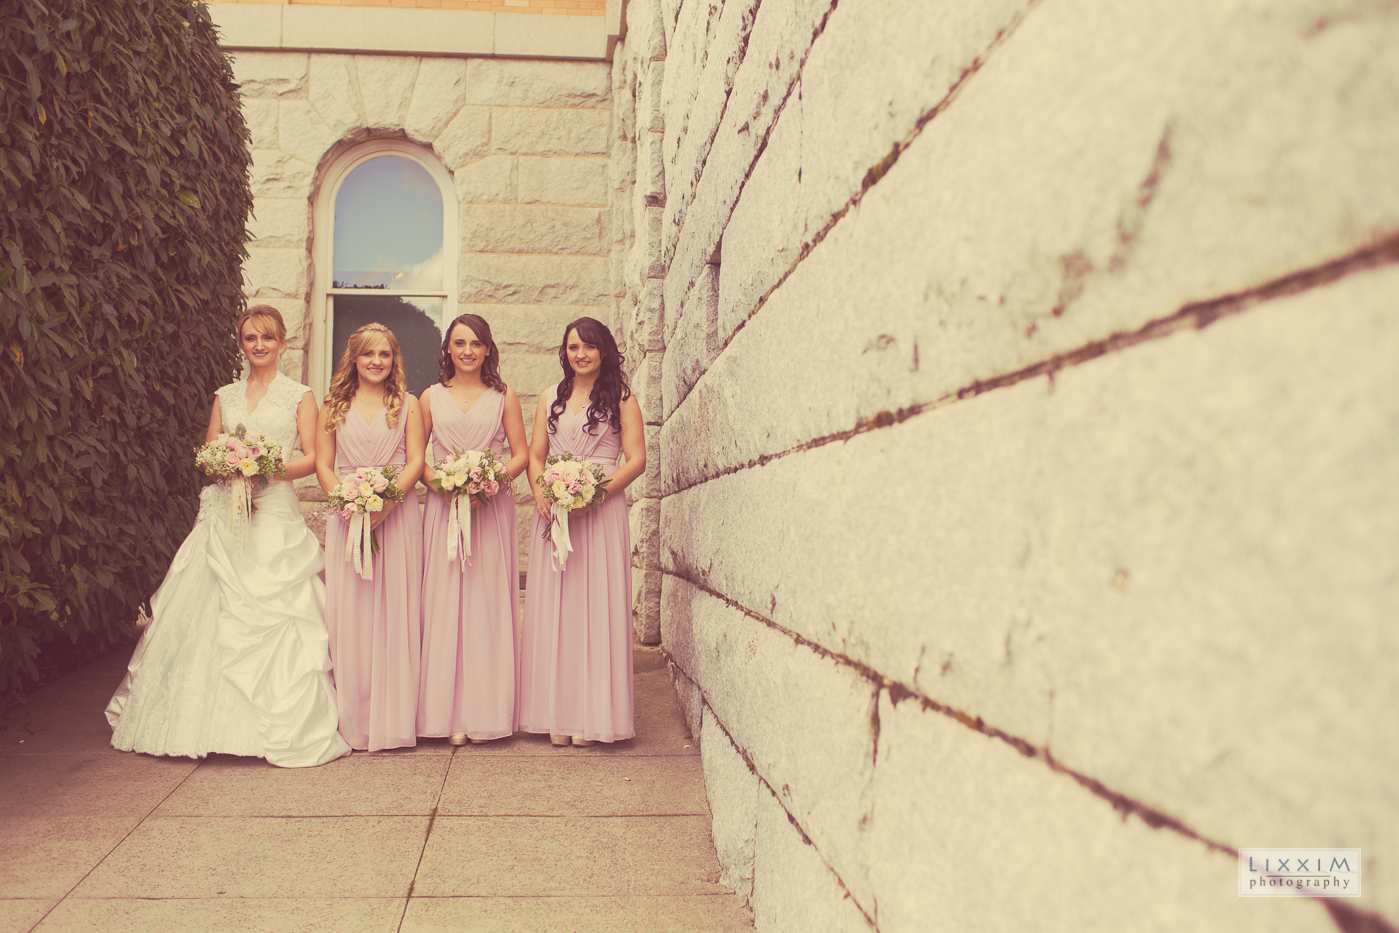 old-auburn-wedding-photoshoot-girls-bridal-party-bride